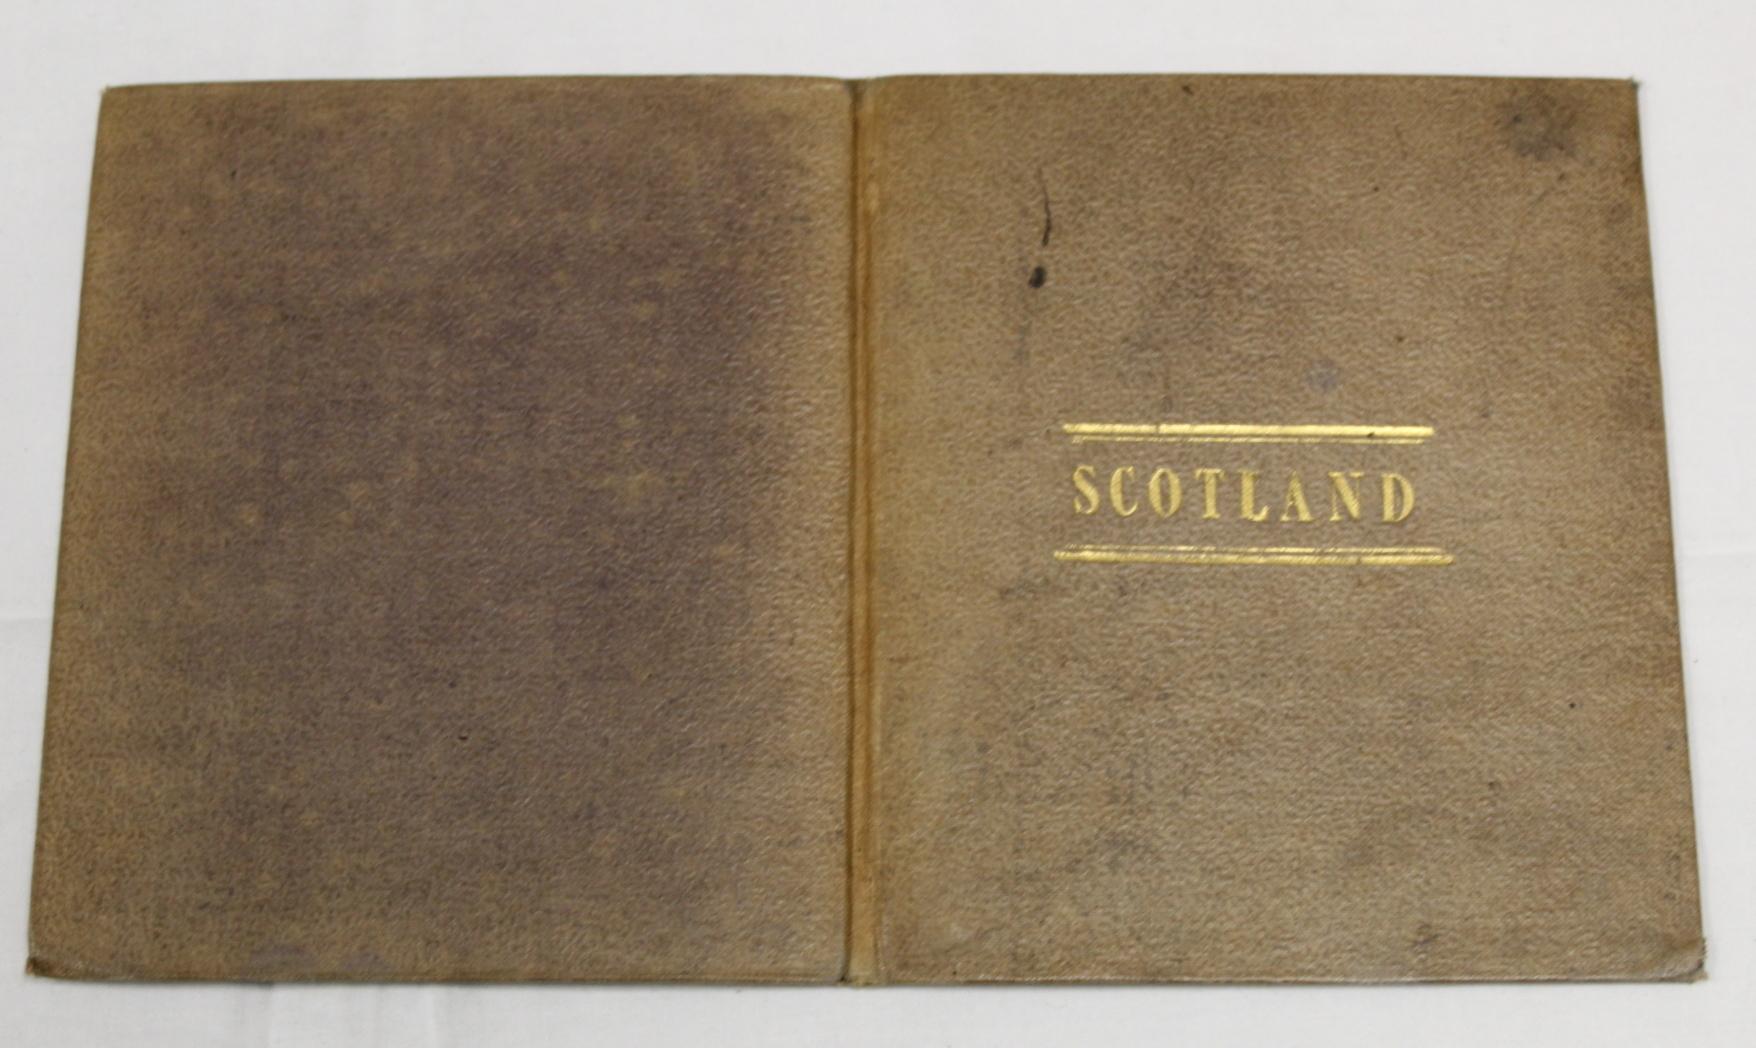 KIRKWOOD J. & SONS.Map of Scotland. Hand col. eng. fldg. linen map in well worn orig. slip case. - Image 18 of 36